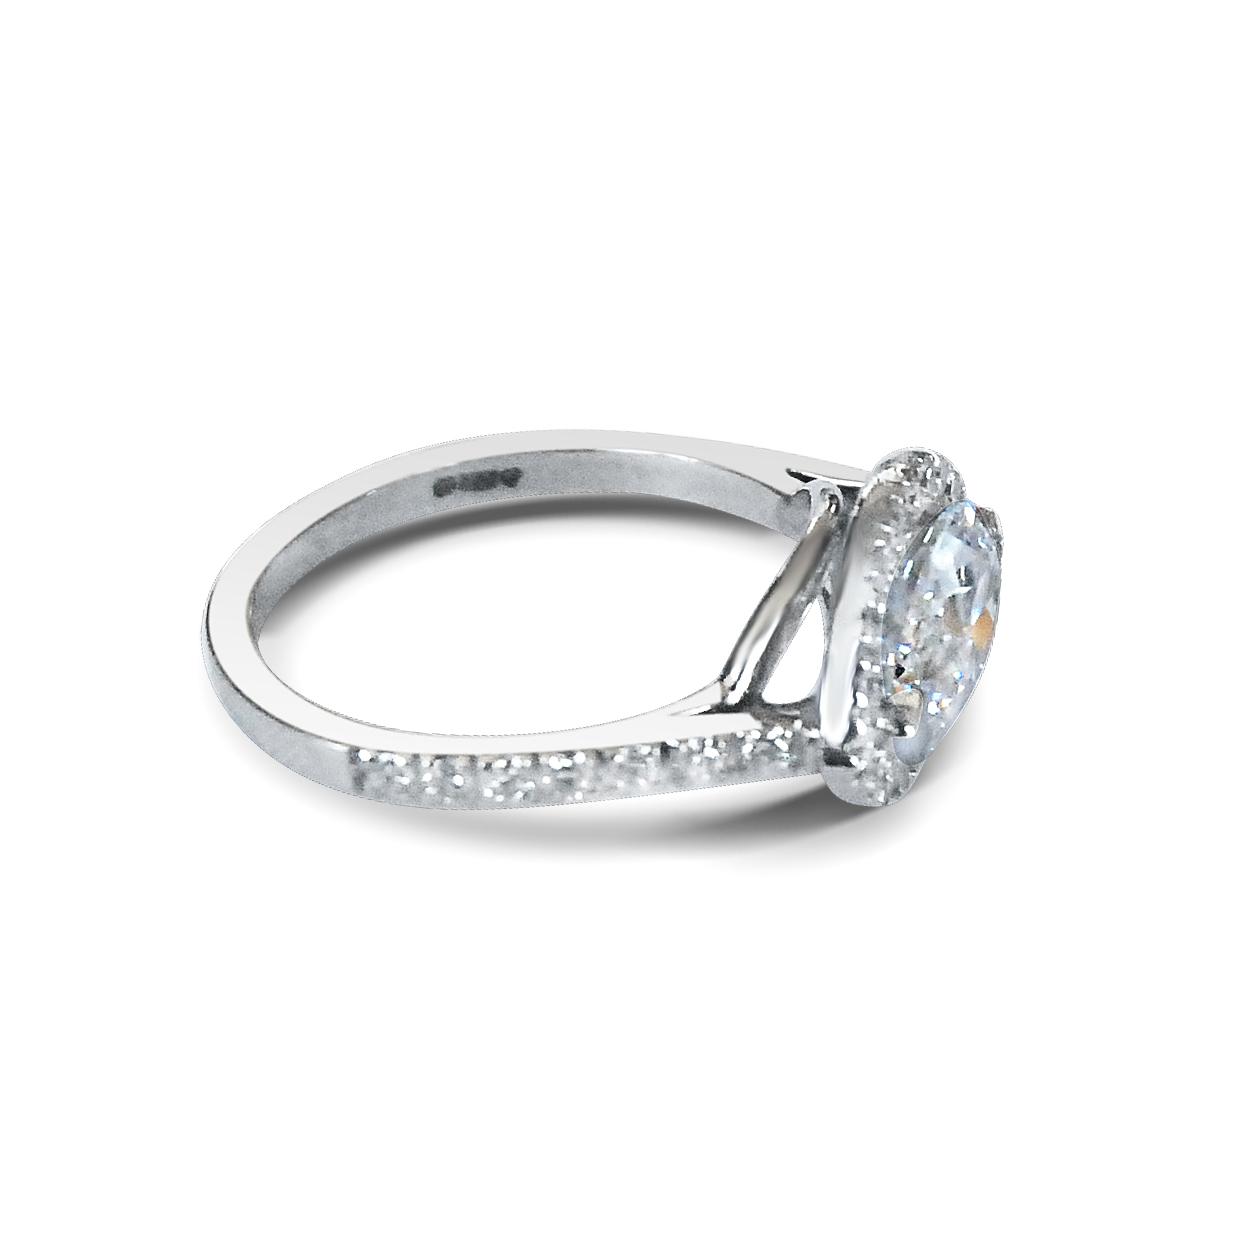 marquise-cut-diamond-engagement-ring-2.jpg